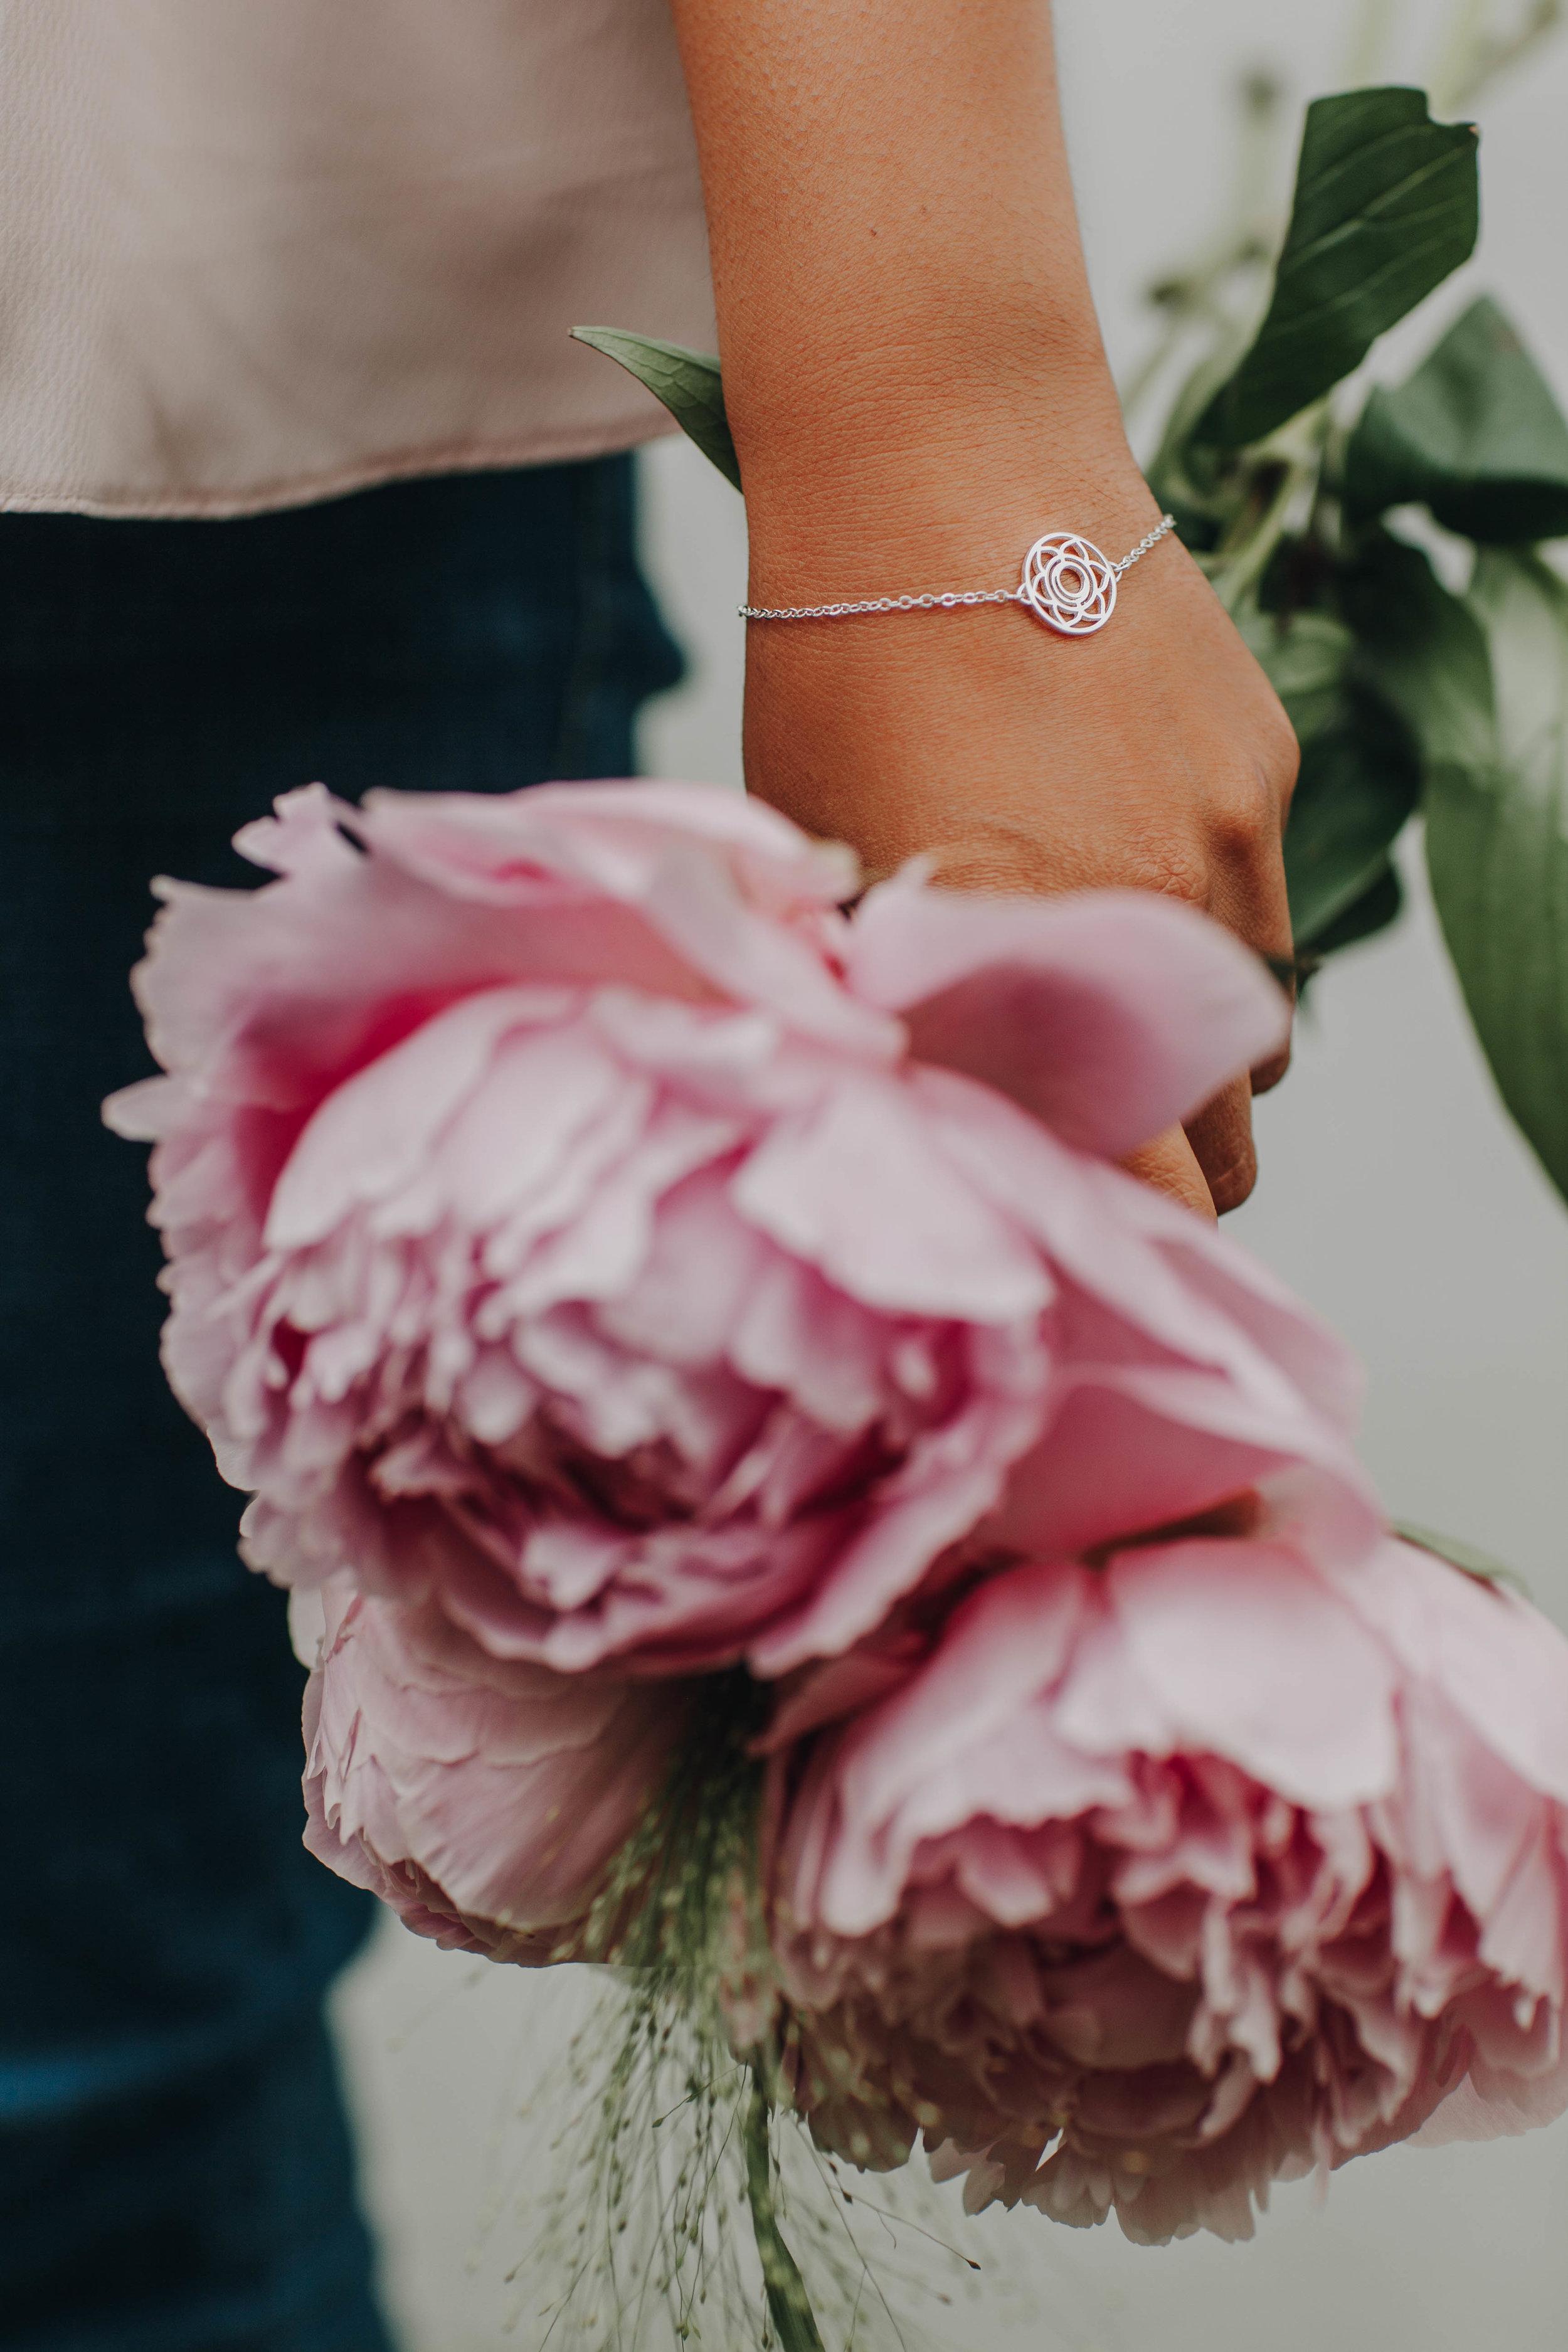 Bracelets-14.jpg